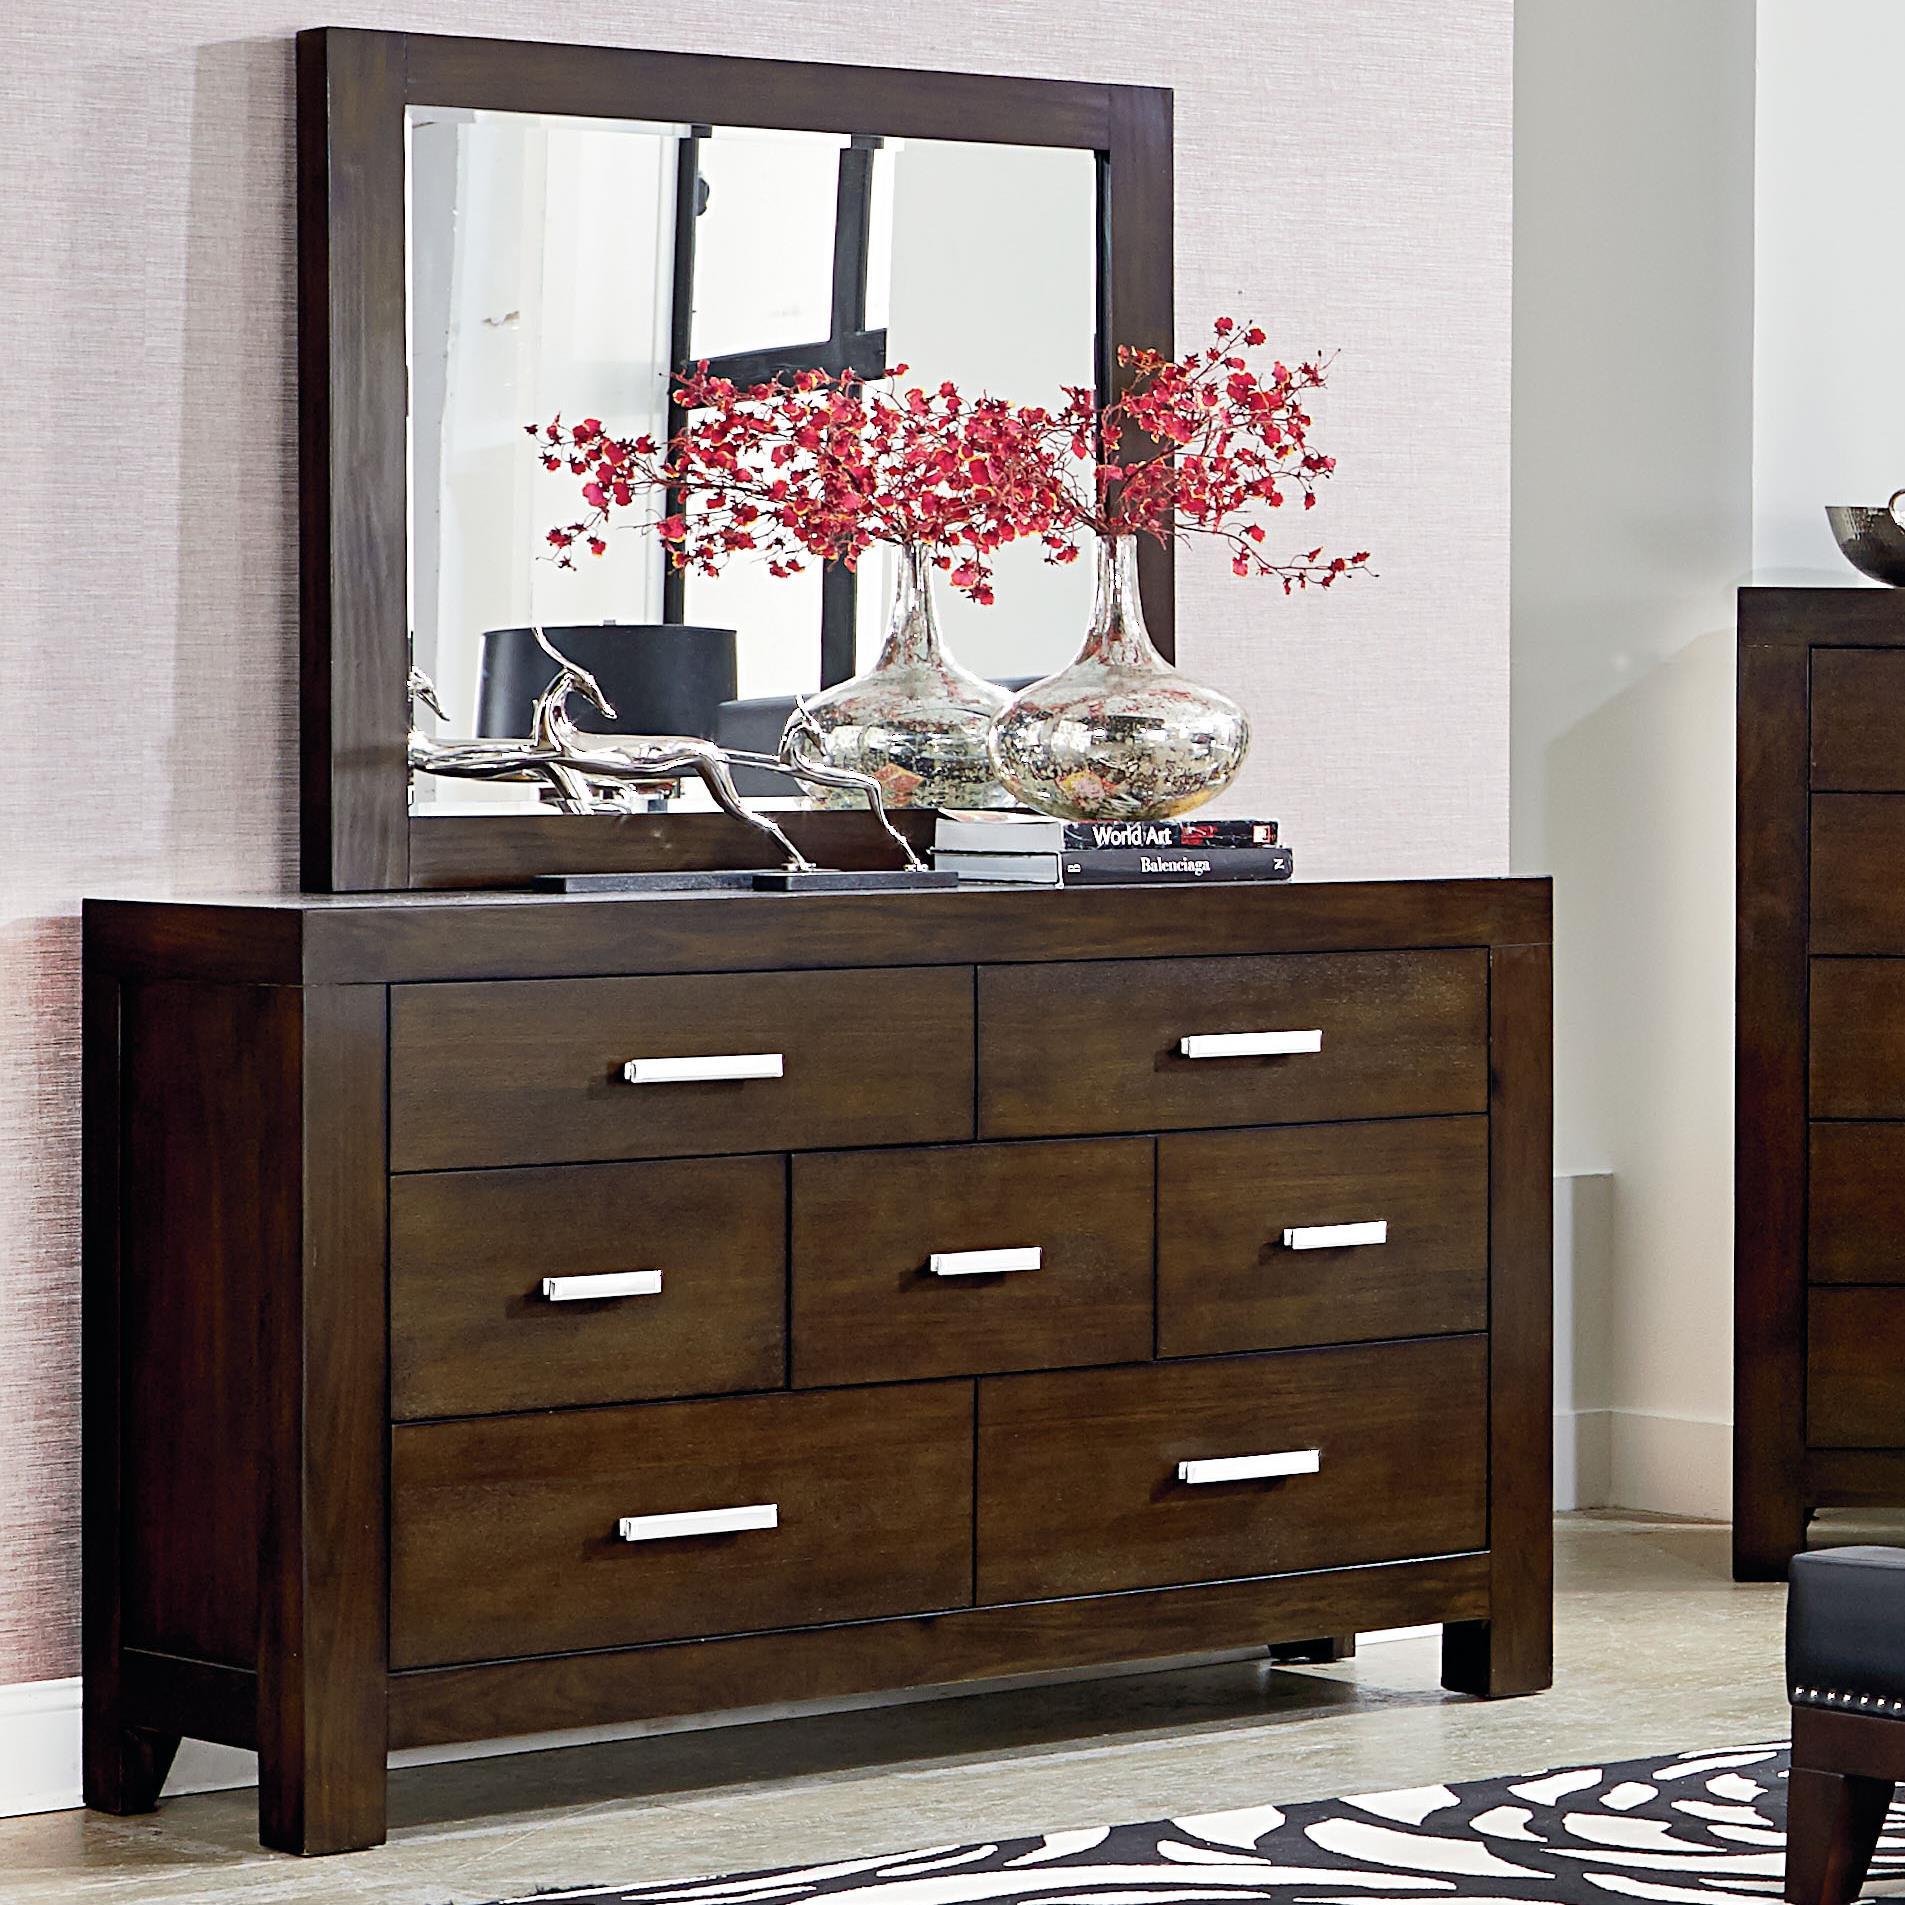 Standard Furniture Couture Dresser and Mirror Set - Item Number: 81558+81559